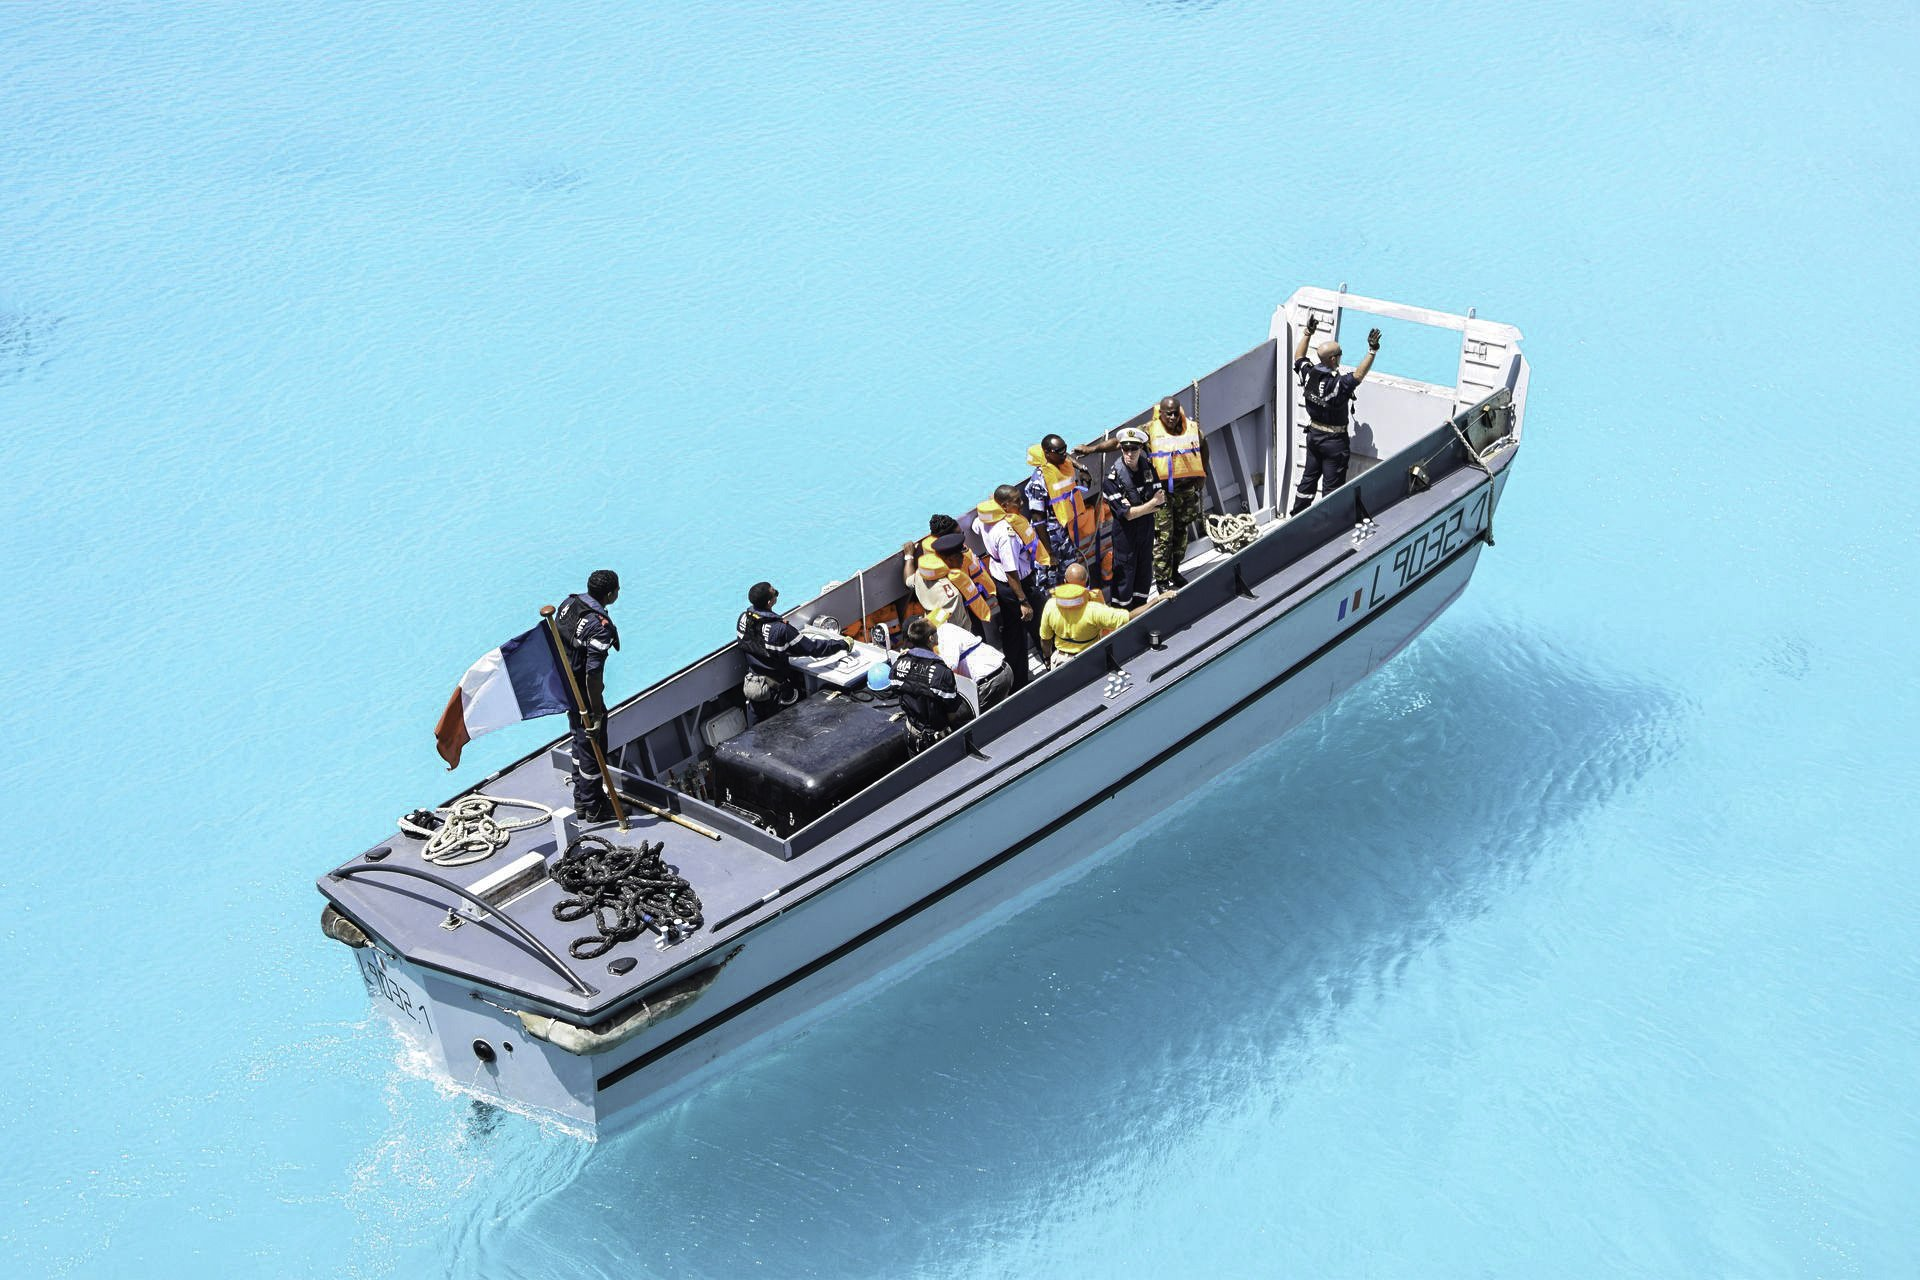 Offres et demandes d'embarquement, convoyage de bateau